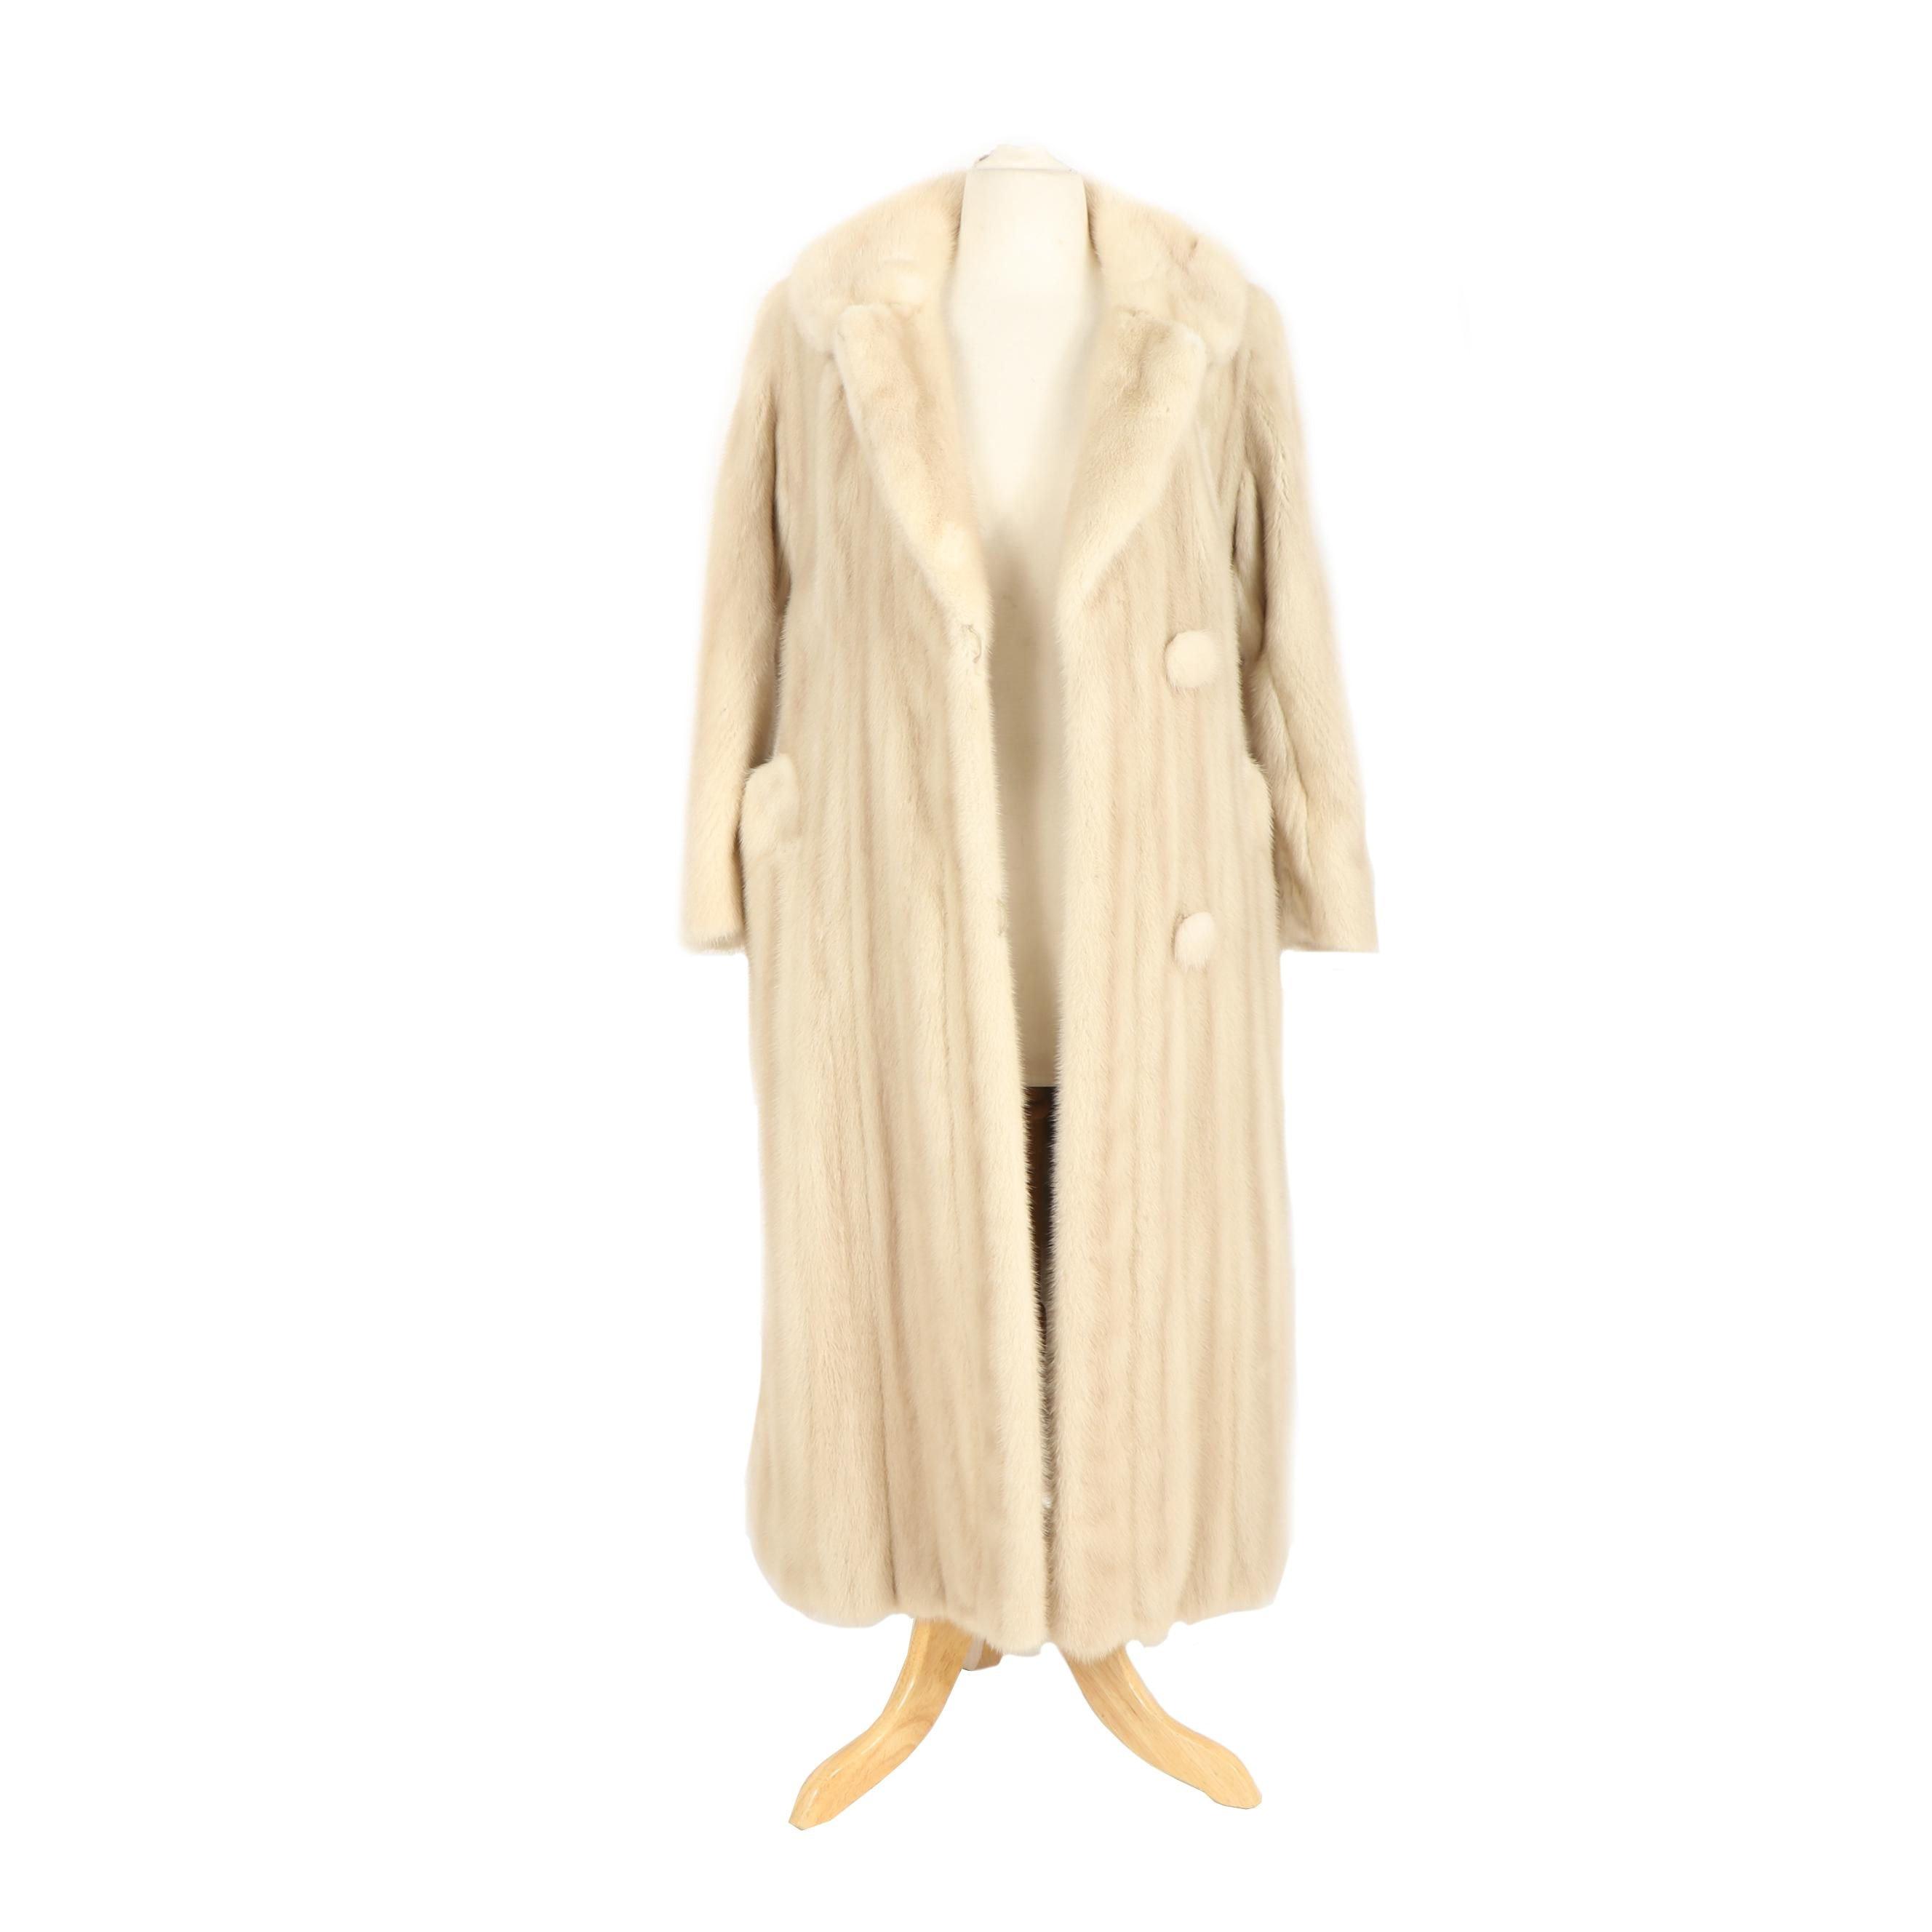 Vintage Tourmaline Mink Fur Coat from Graggs of Wichita